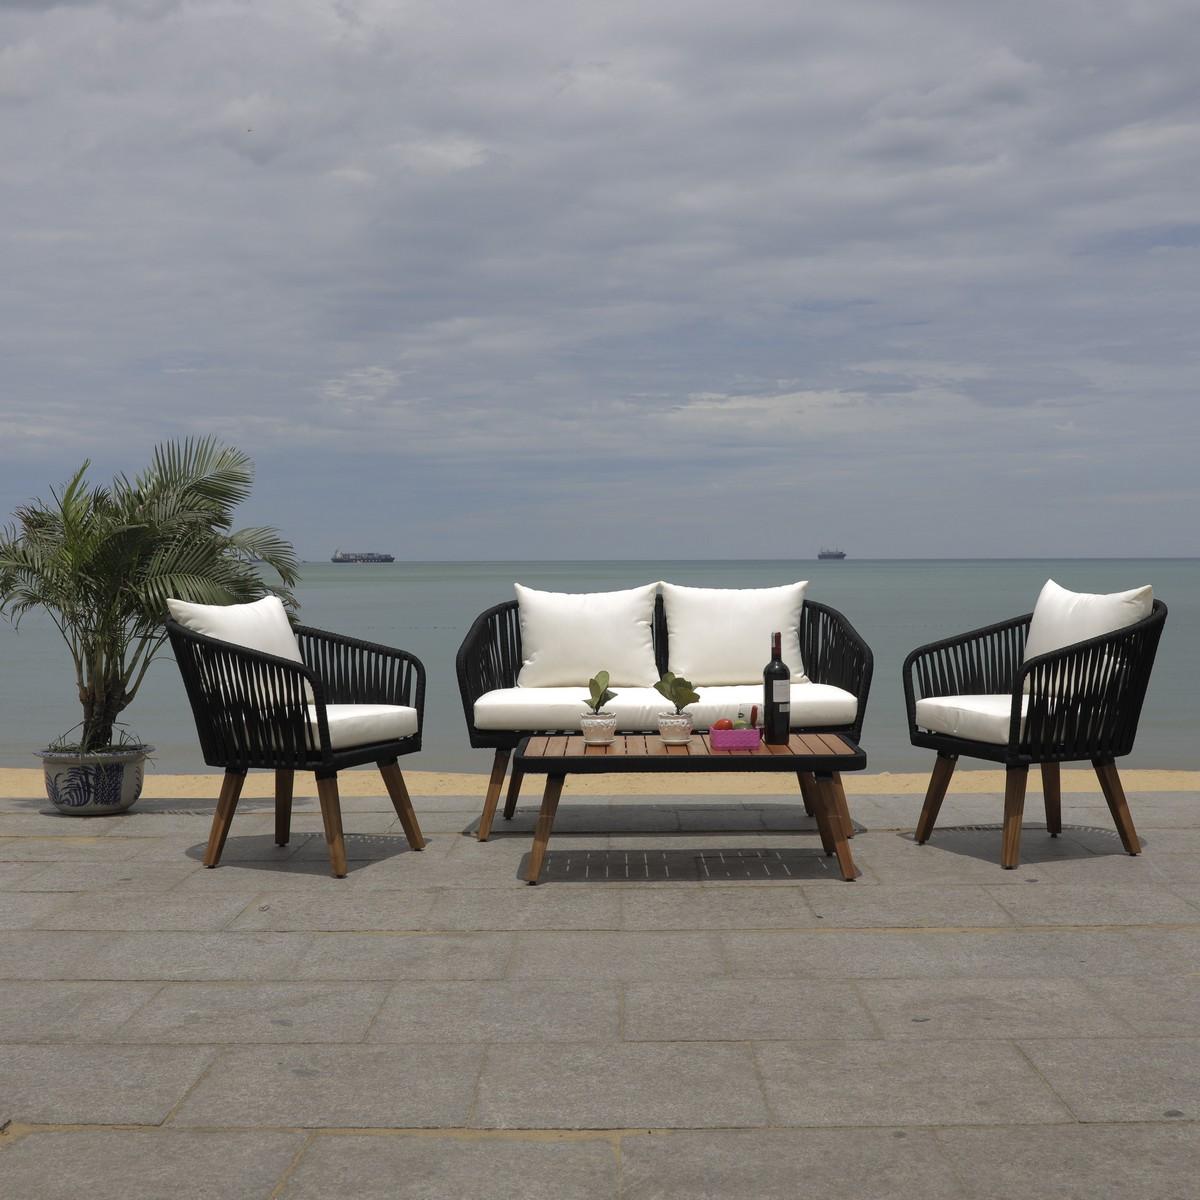 PAT7074B Patio Sets - 4 Piece - Furniture by Safavieh on Safavieh Ransin id=89784